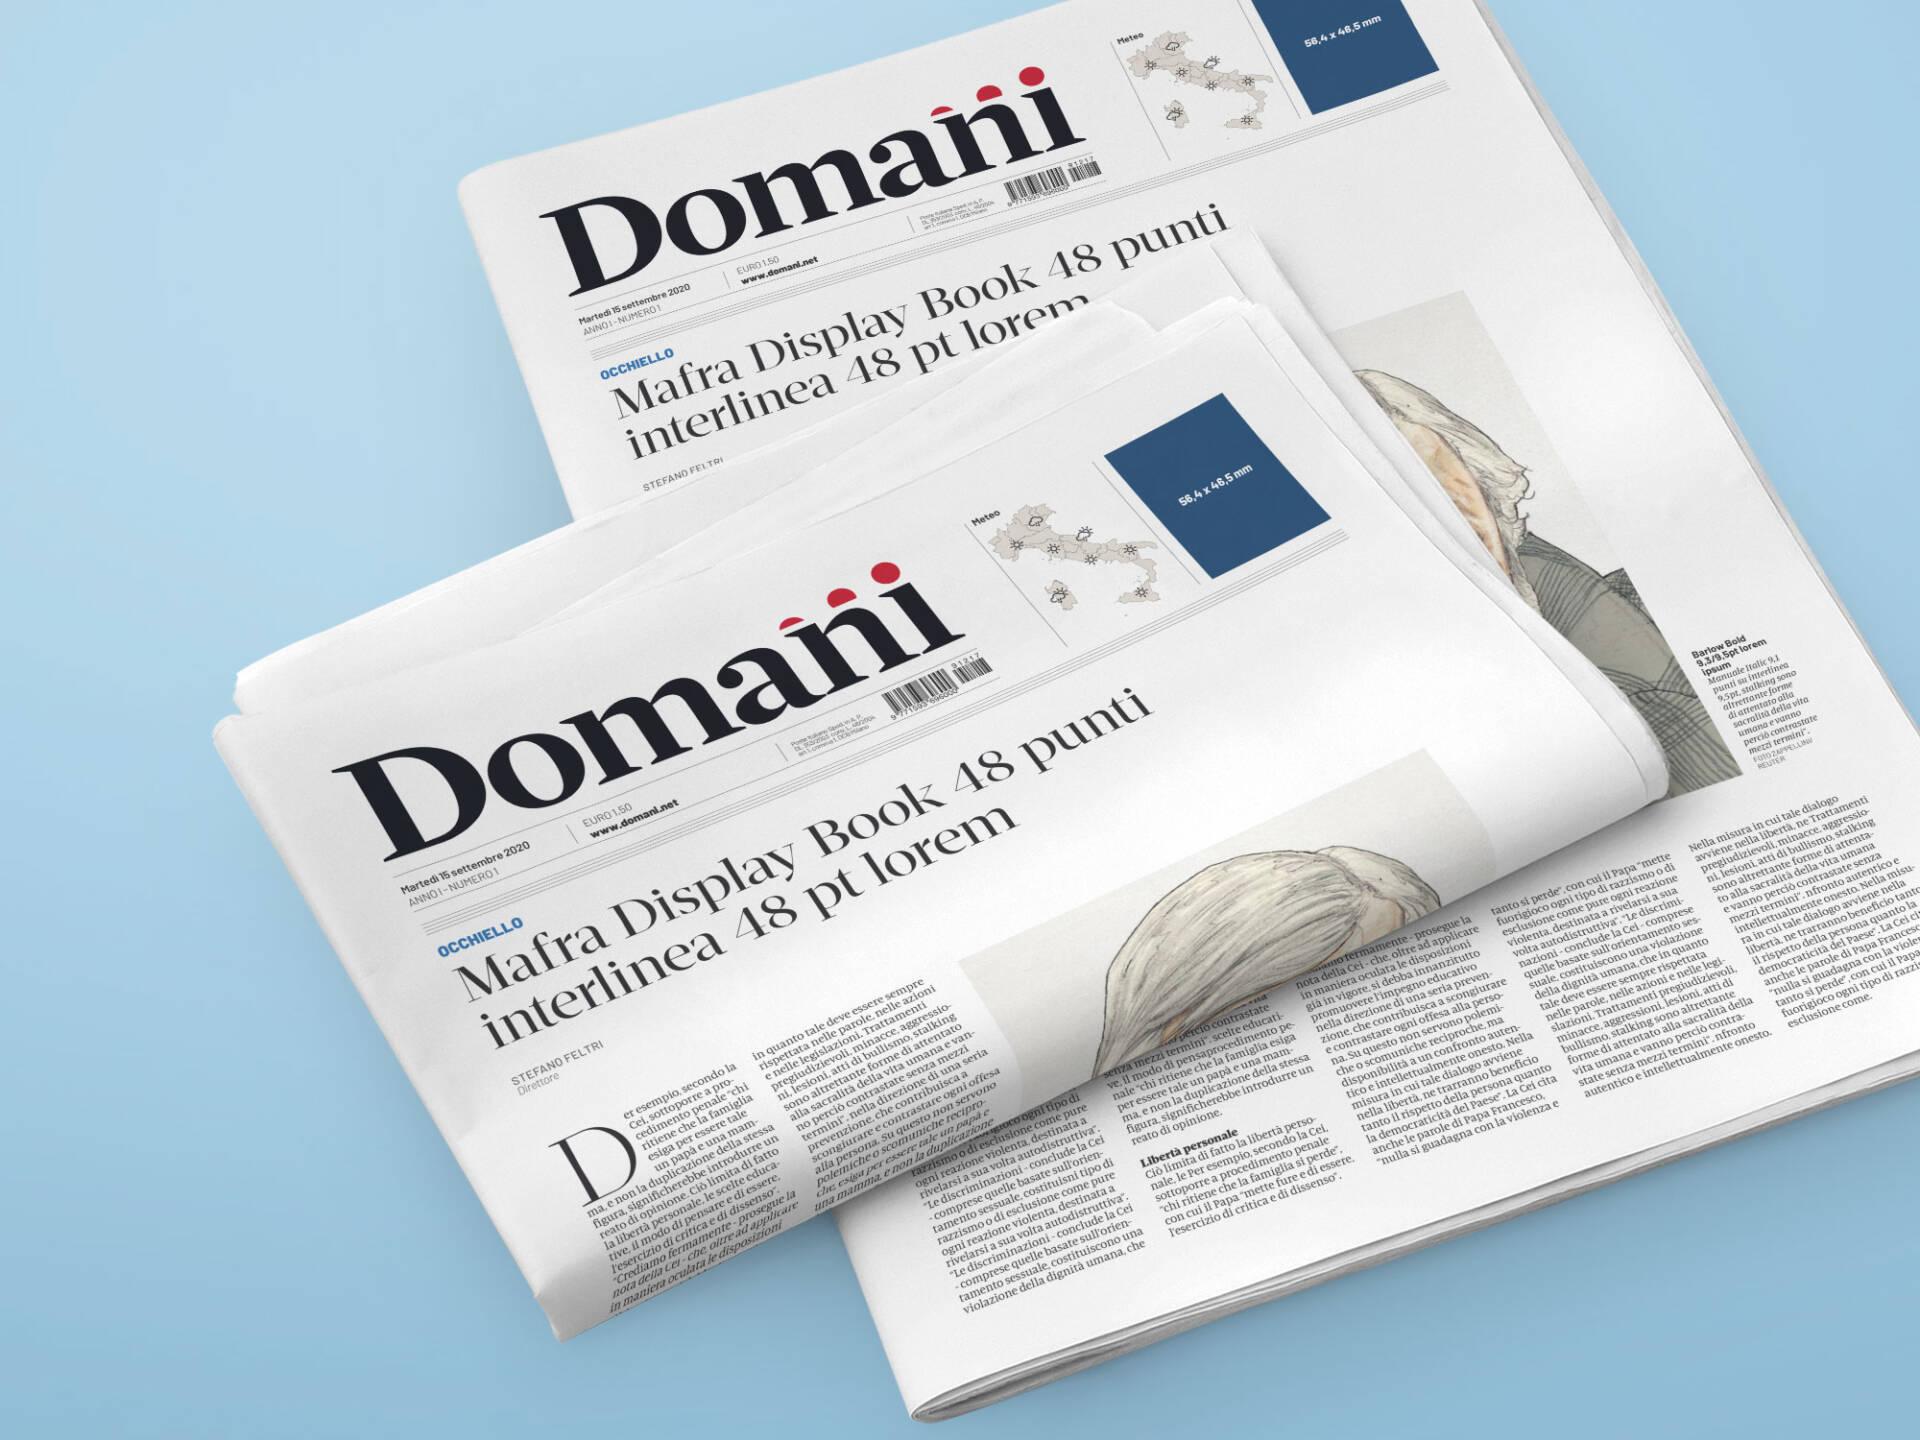 Domani_Print_Frontpage_Wenceslau_News_Design05